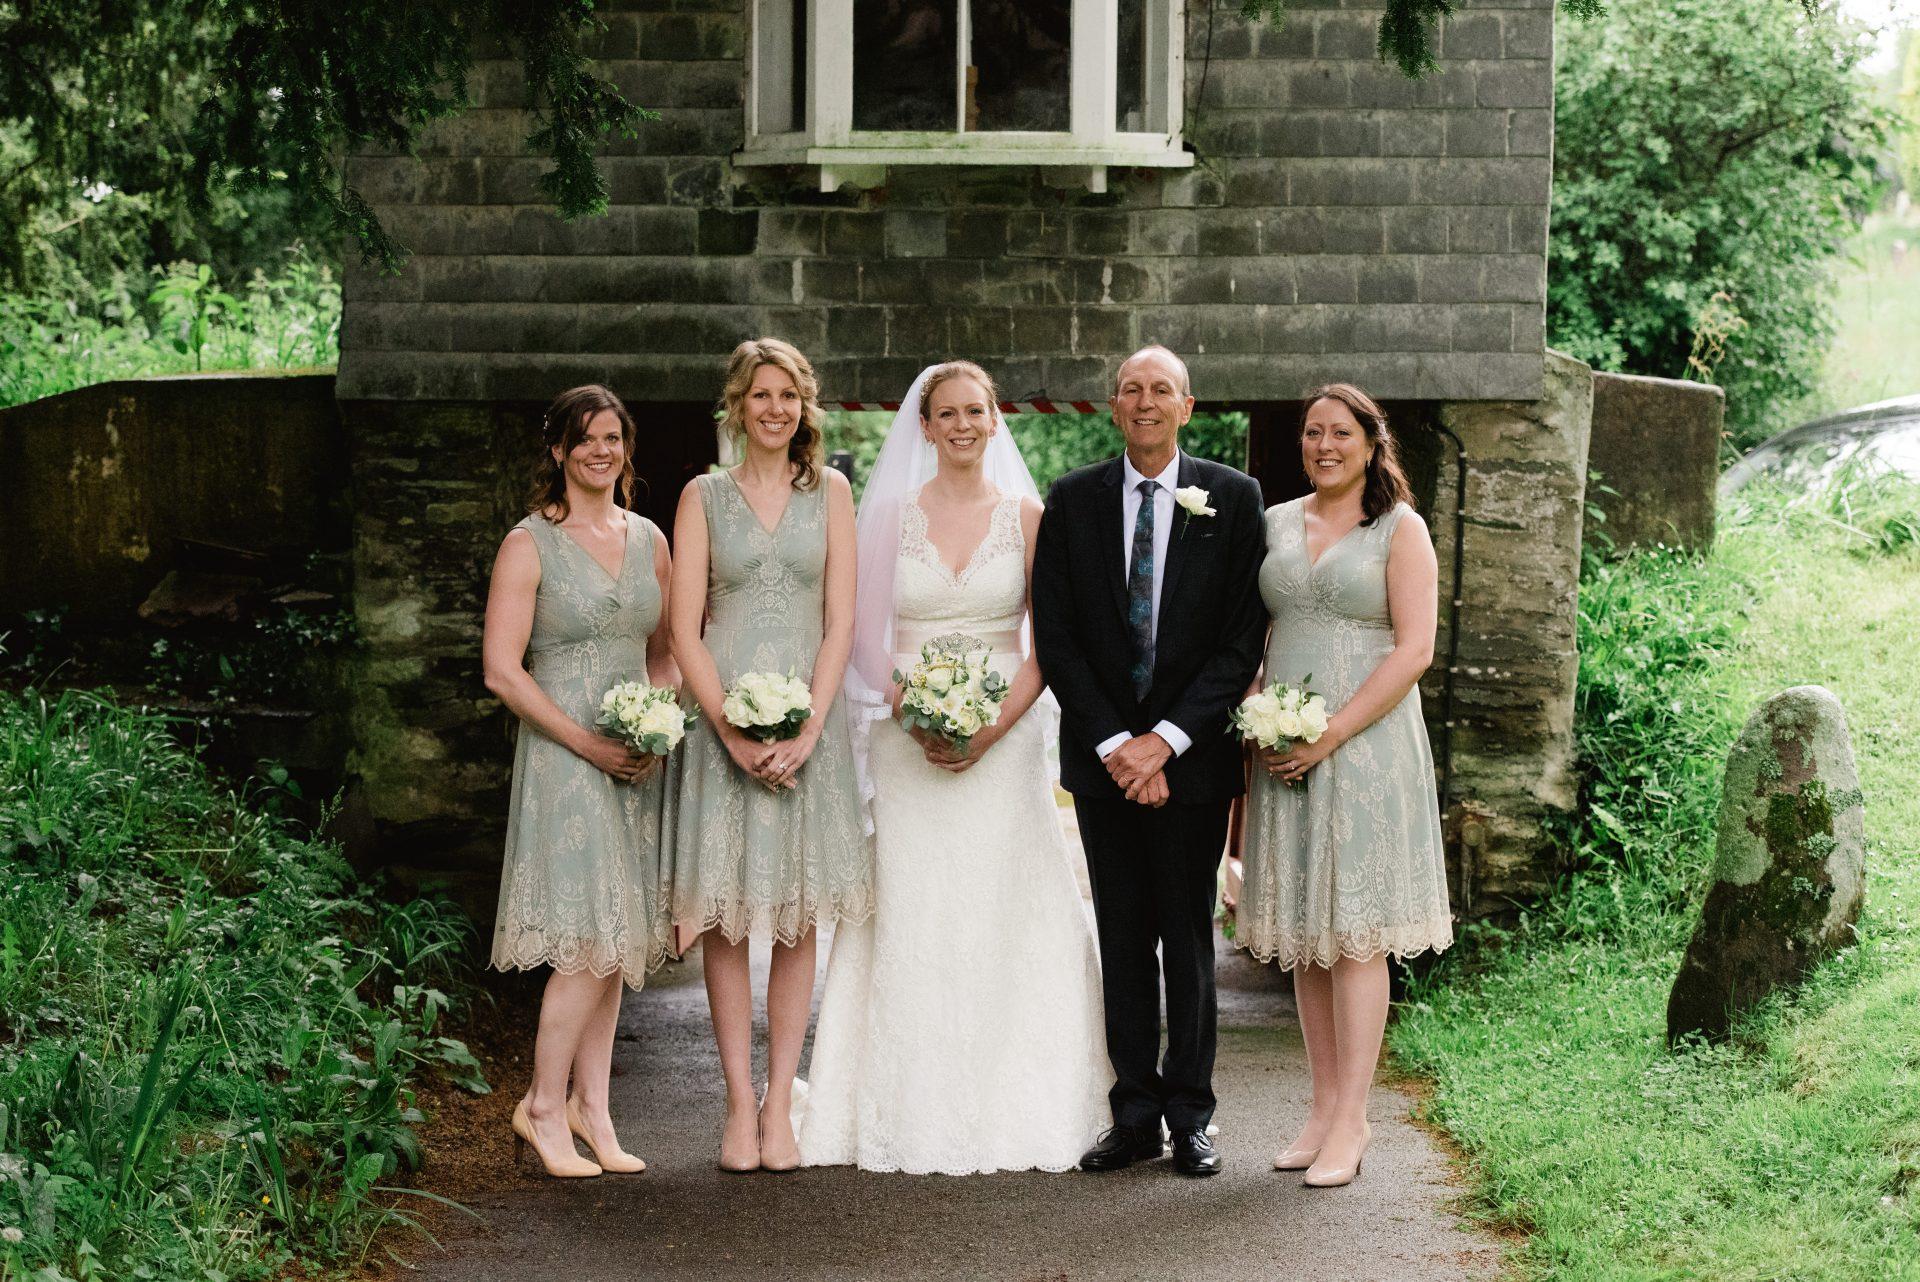 Feock Church Wedding, Cornwall